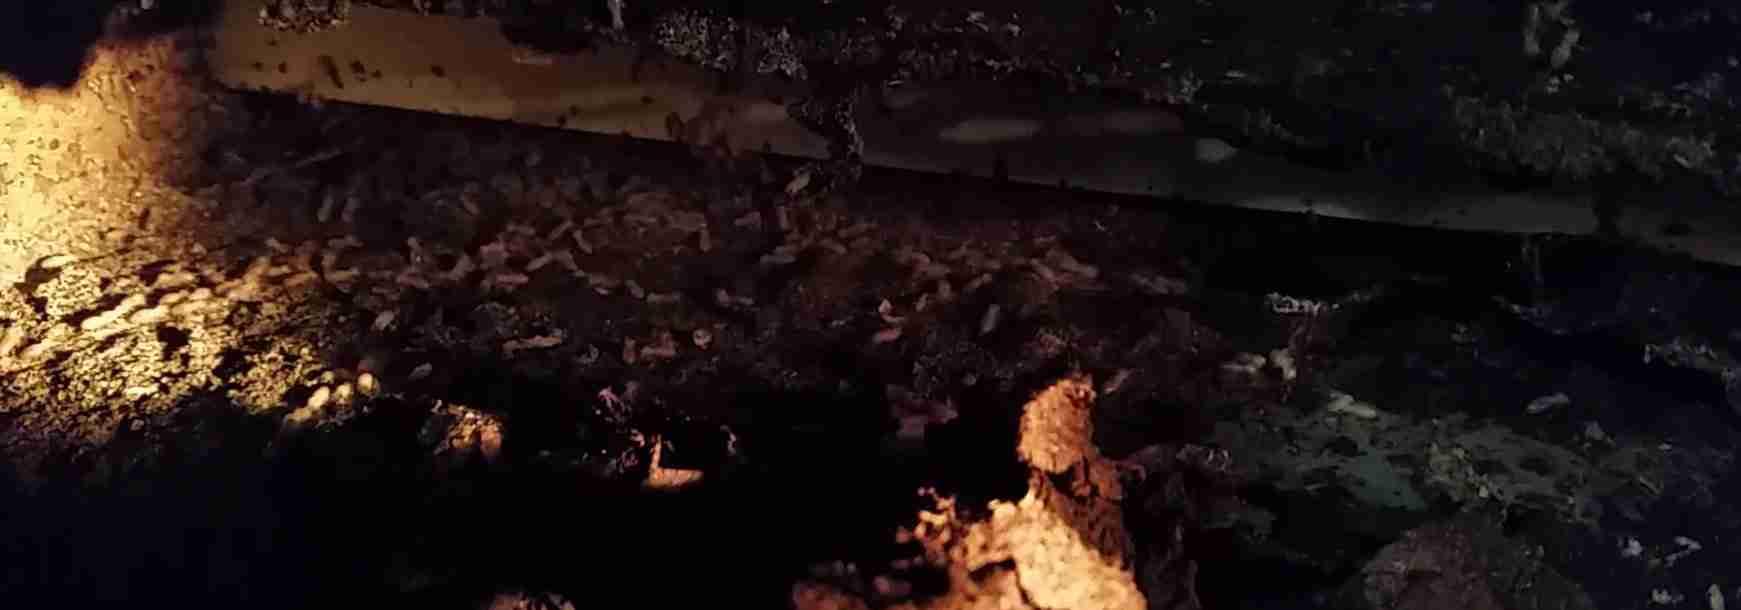 Caboolture Pest Control Termite Treatments